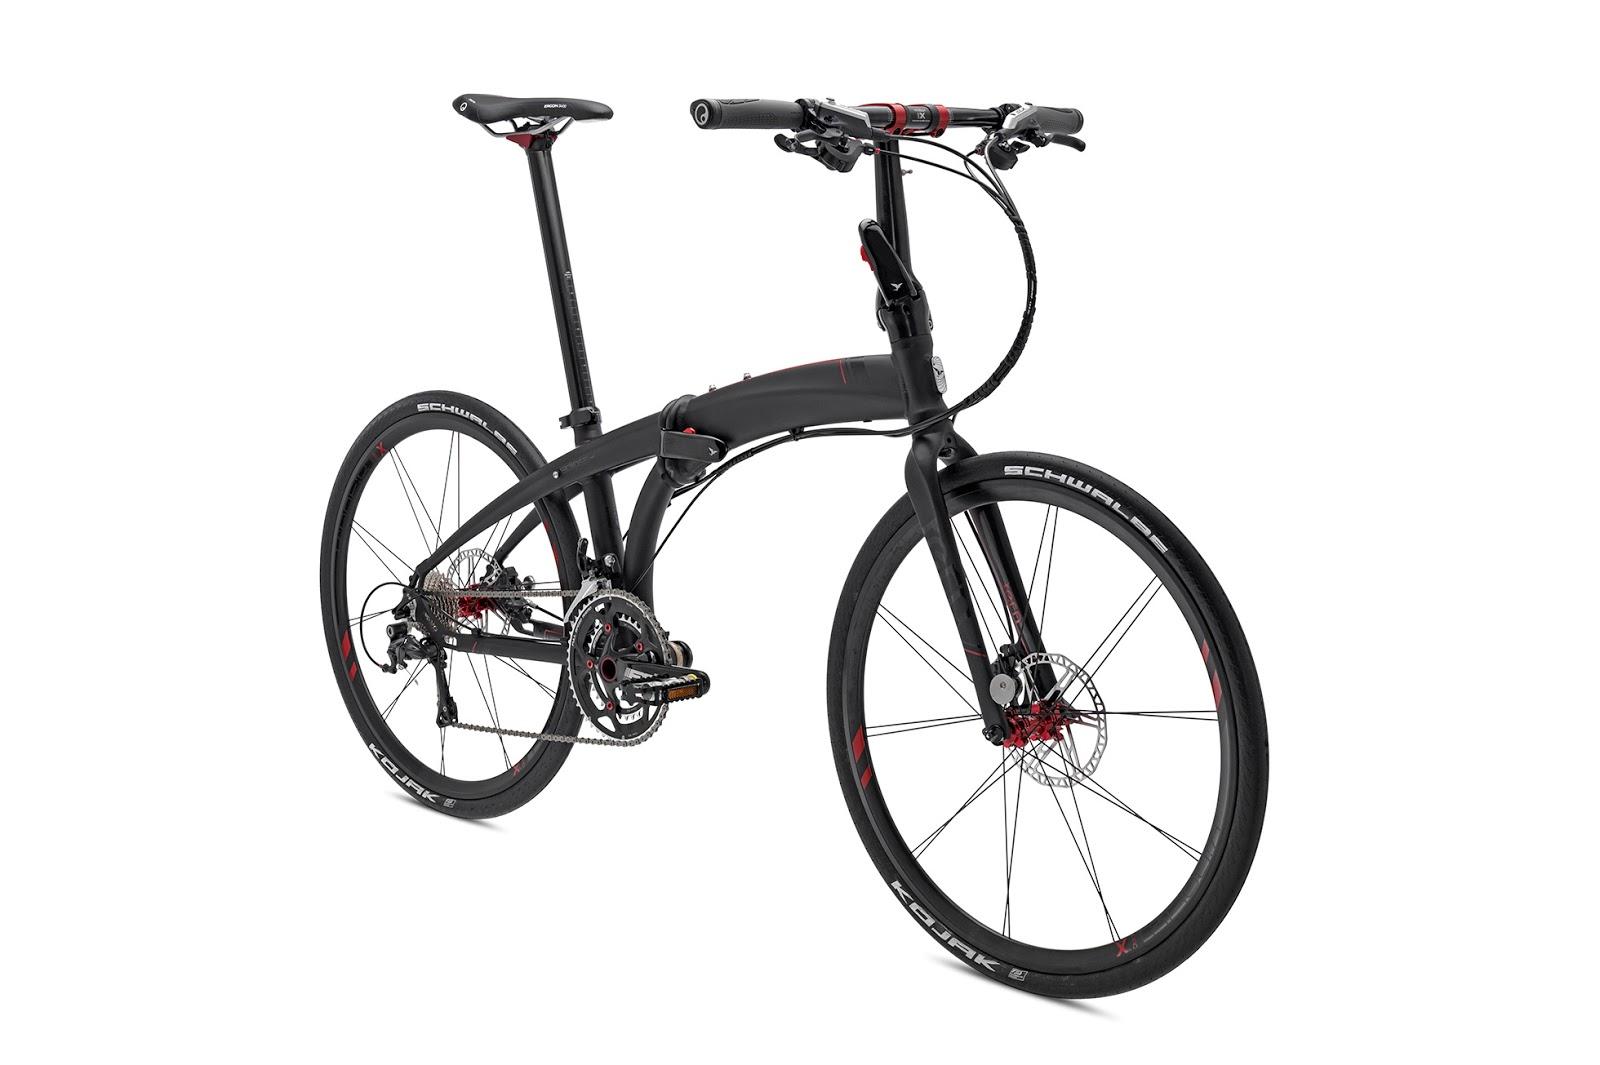 Serba sepeda: Tern Eclipse X22 (2018) Folding Bike. Harga